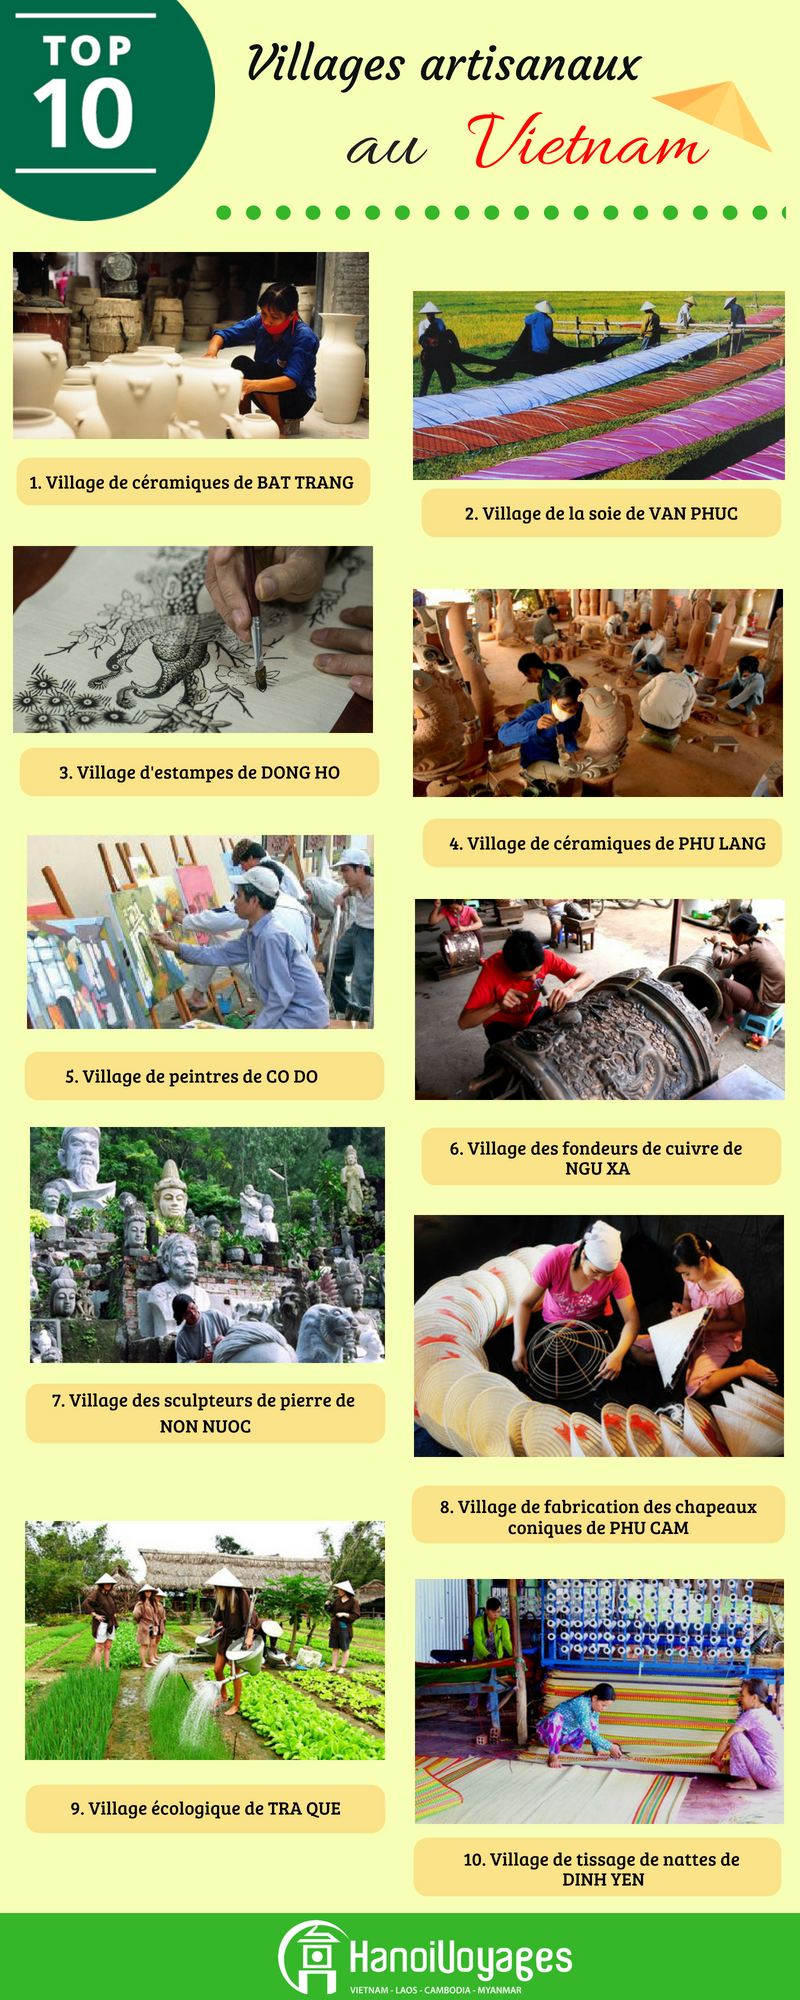 Top 10 villages artisanaux Vietnam - Âme du Vietnam